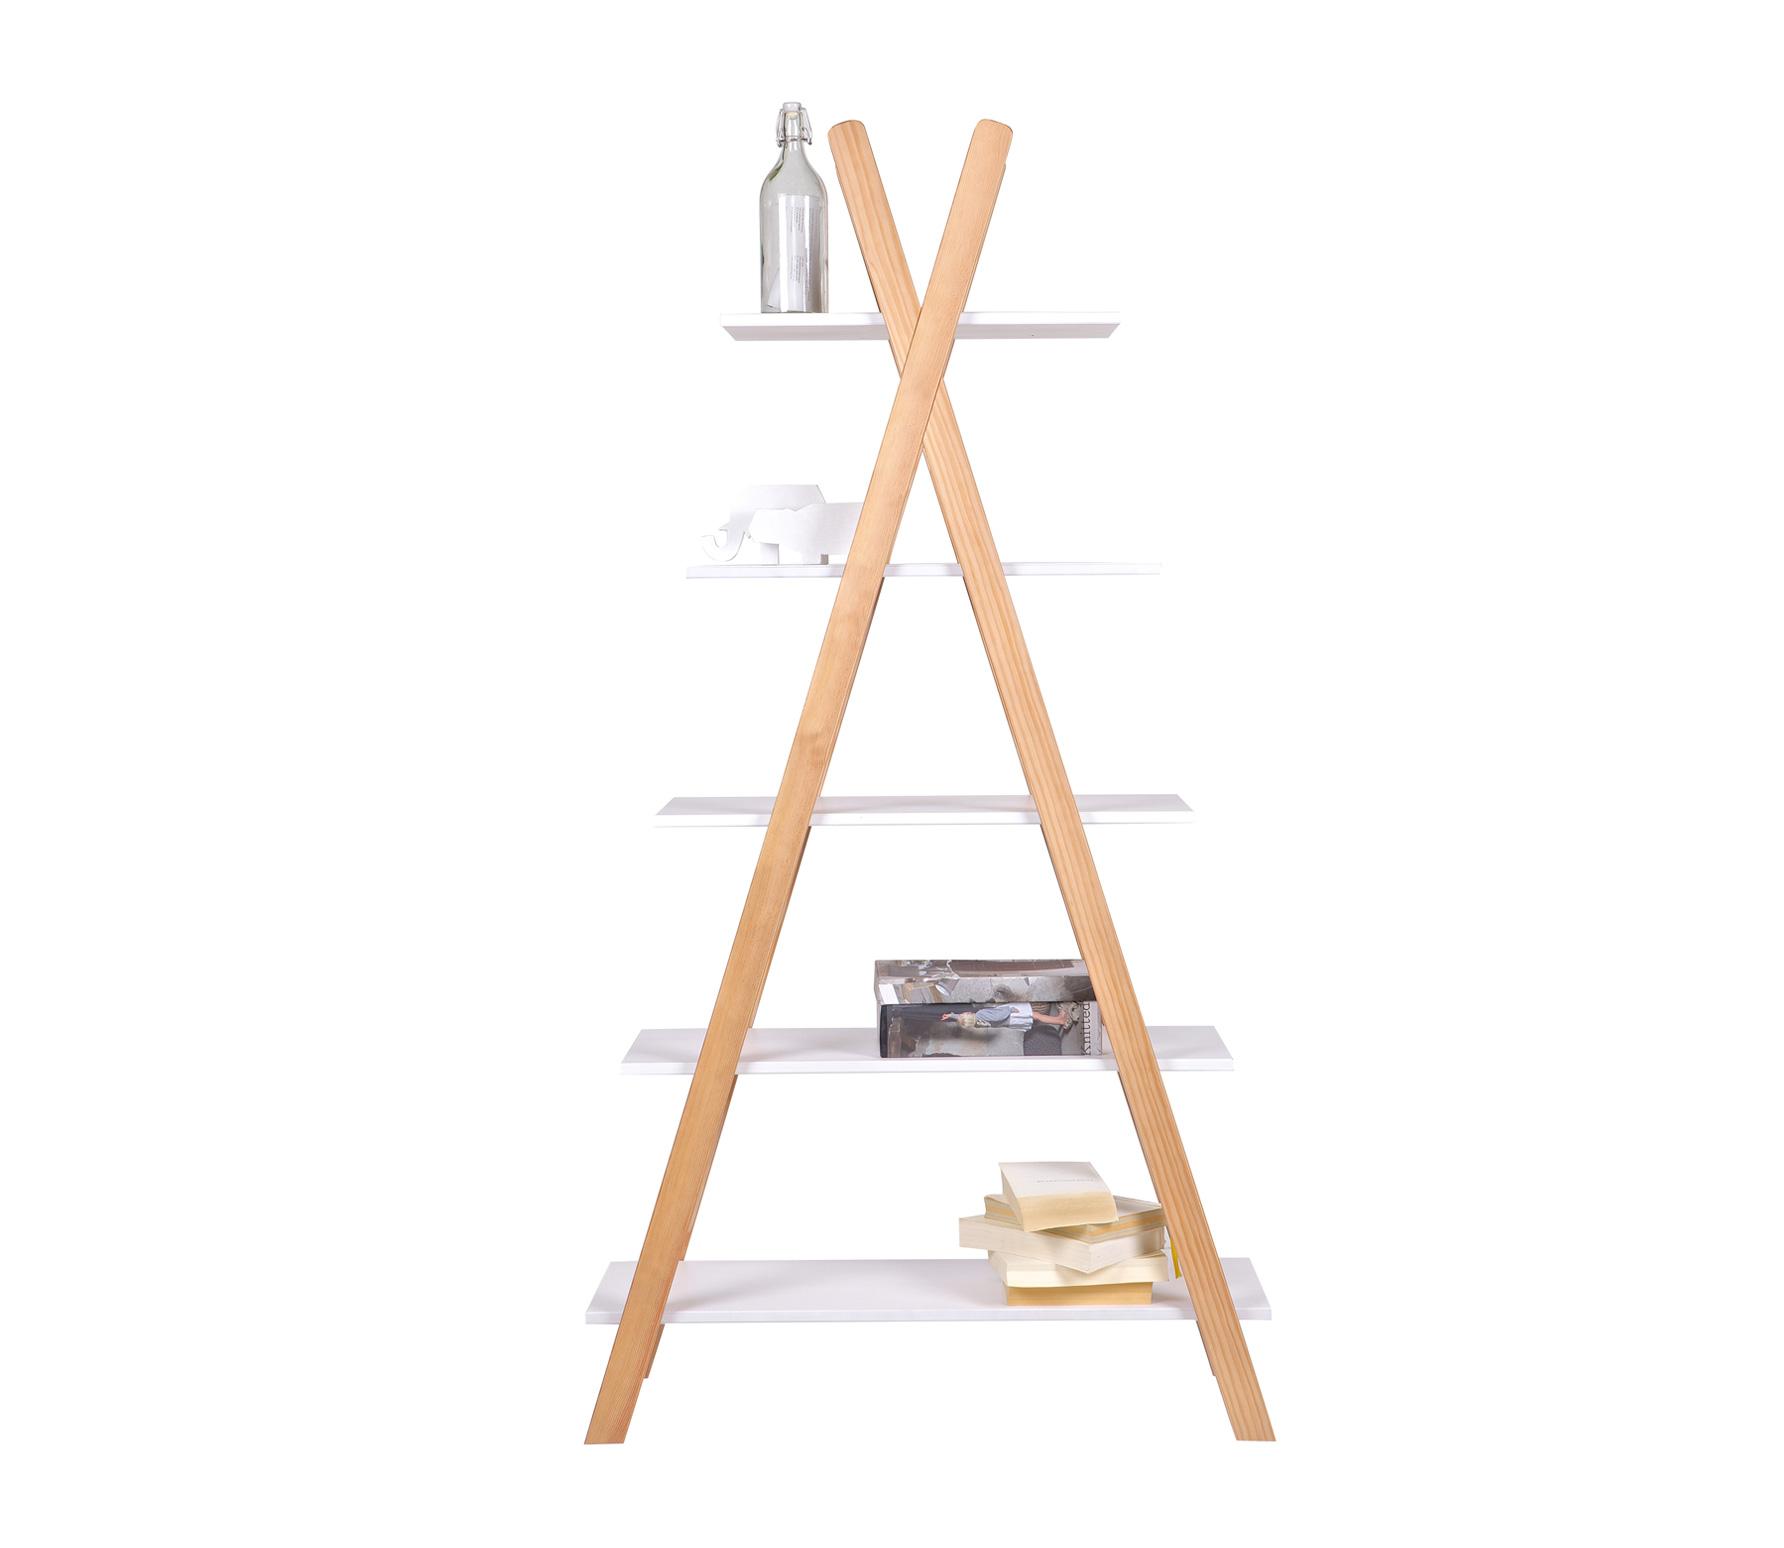 WOOOD Tipi boekenkast 177x85x39 cm hout wit/naturel